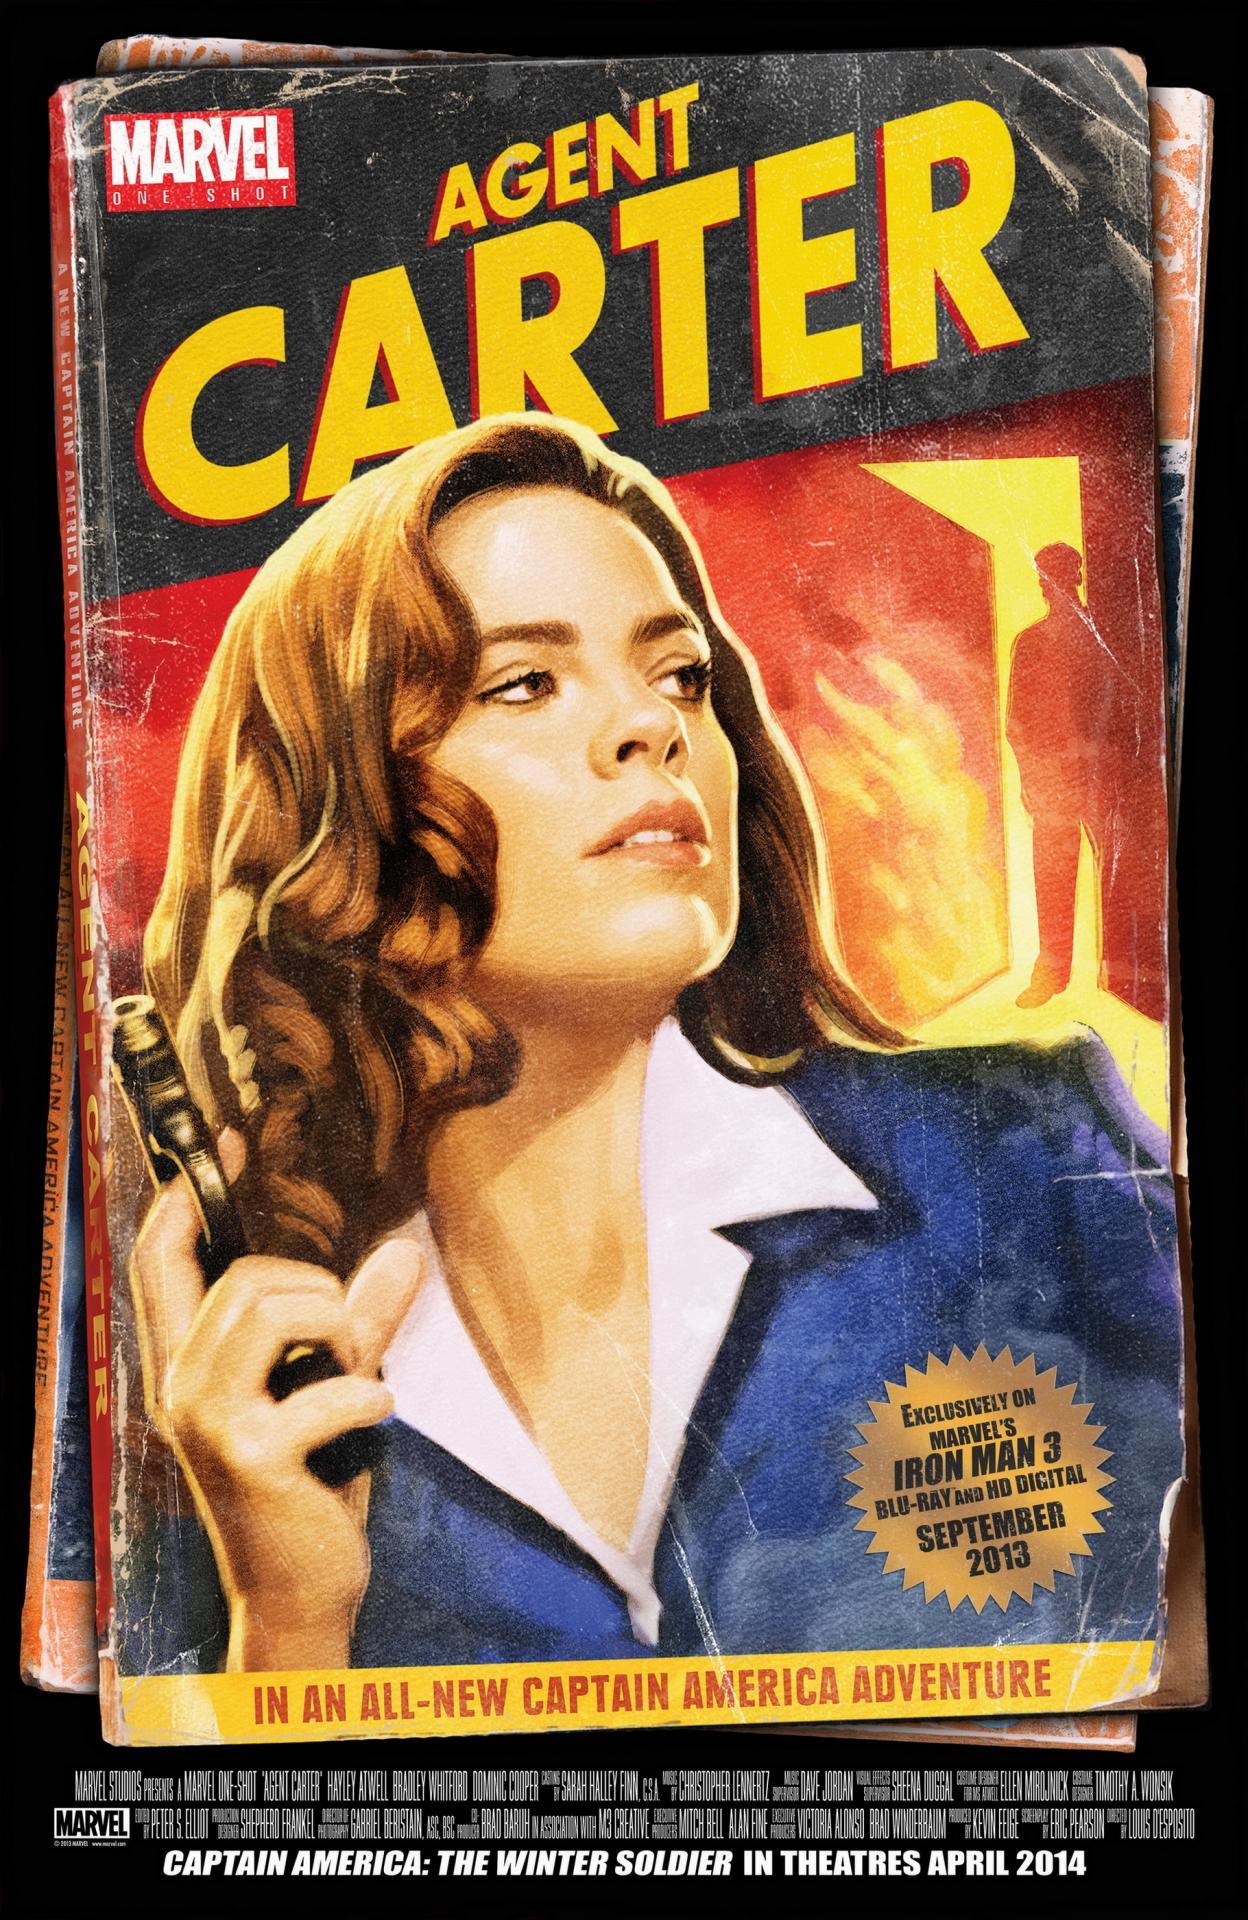 Agentcarter oneshot poster